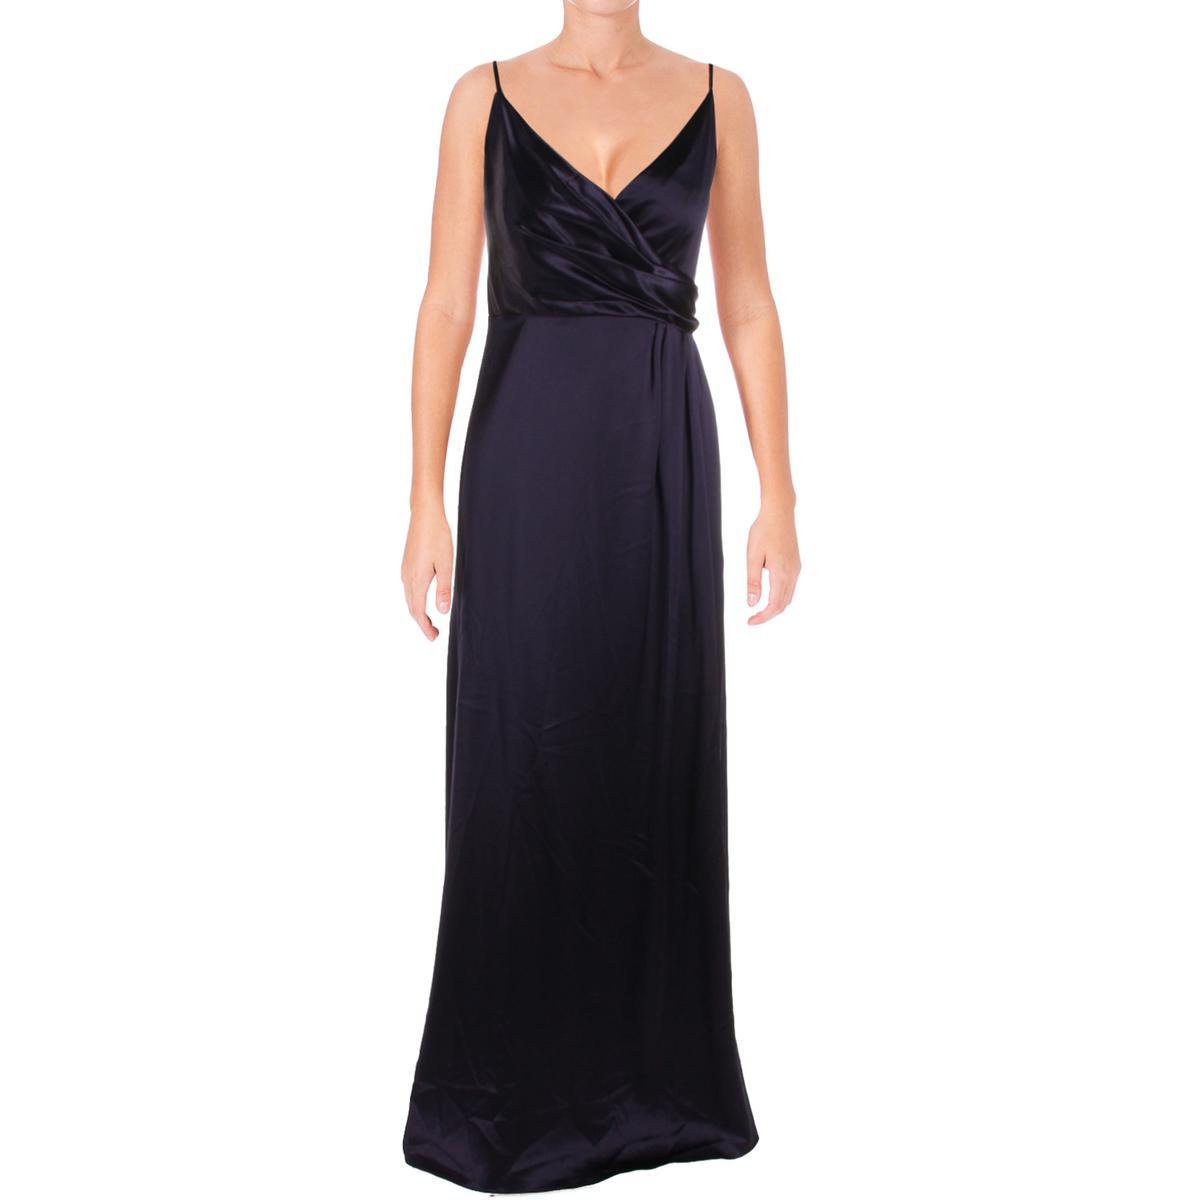 Jill Jill Stuart Womens Crossover Slip Gown Deep Violet 12 Regular